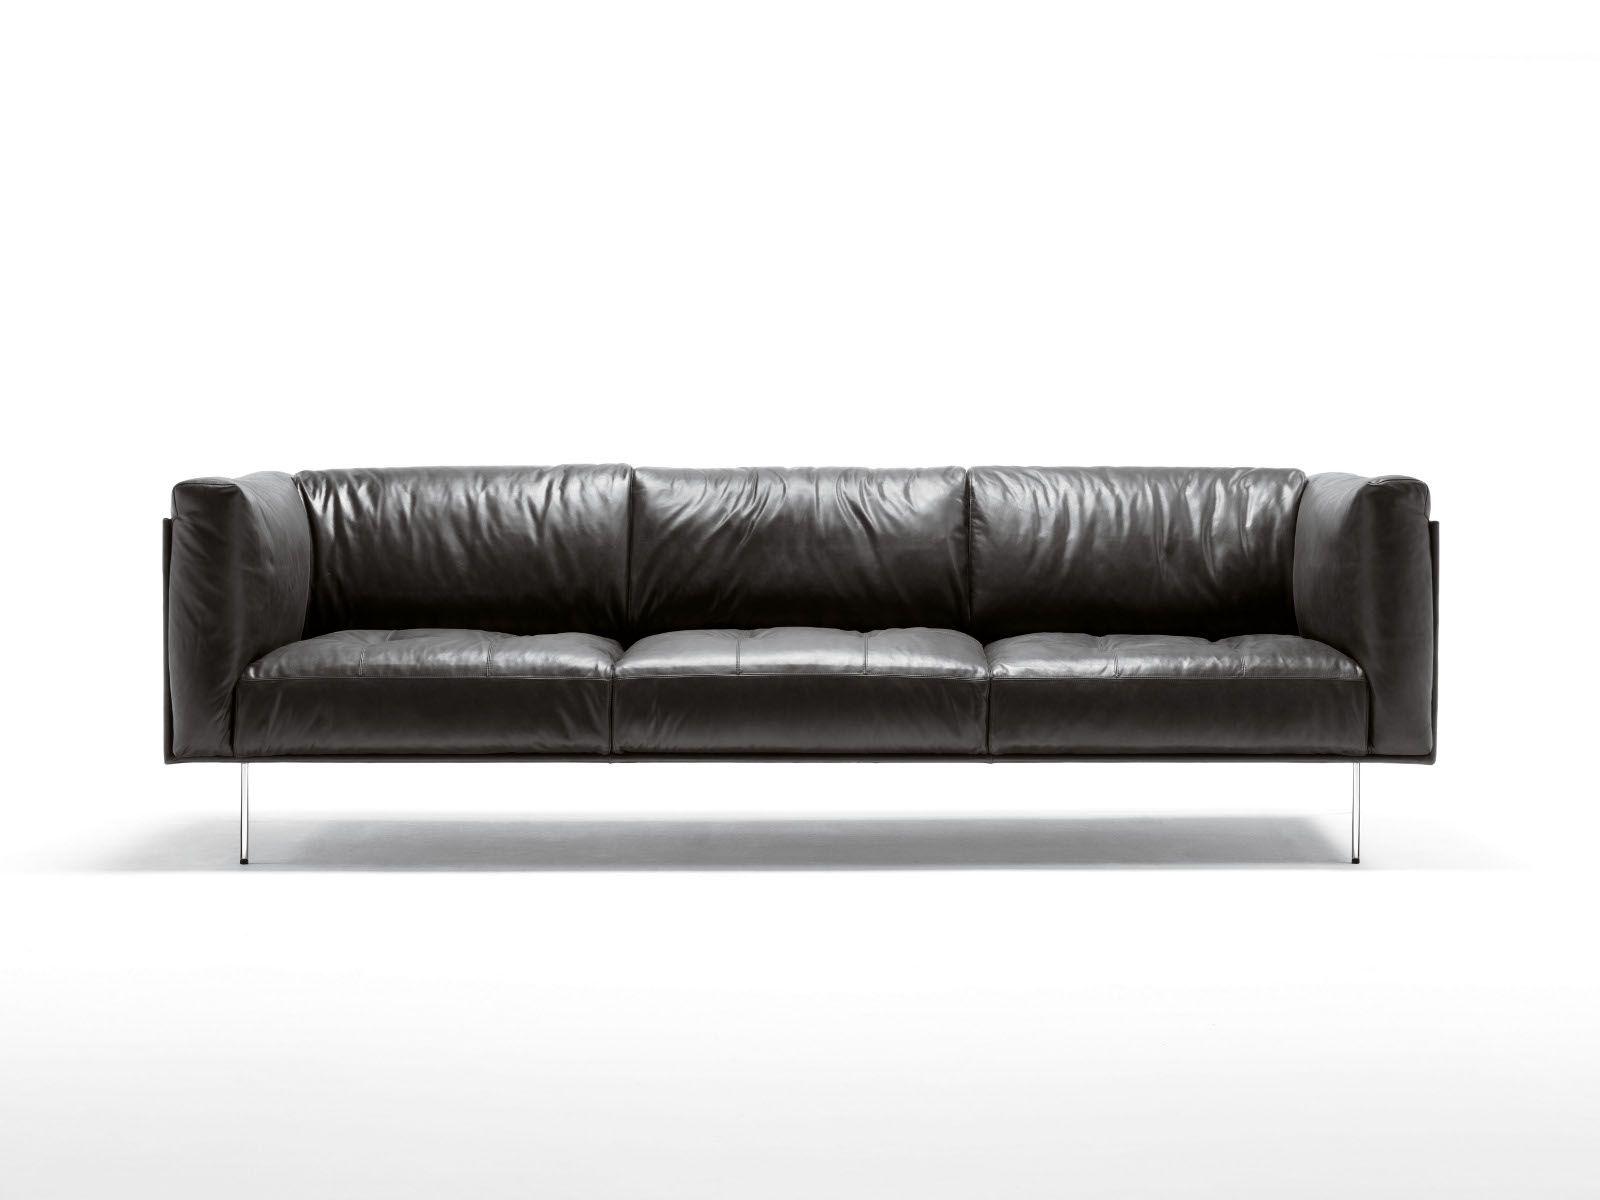 ROD Sofa by Living Divani design Piero Lissoni